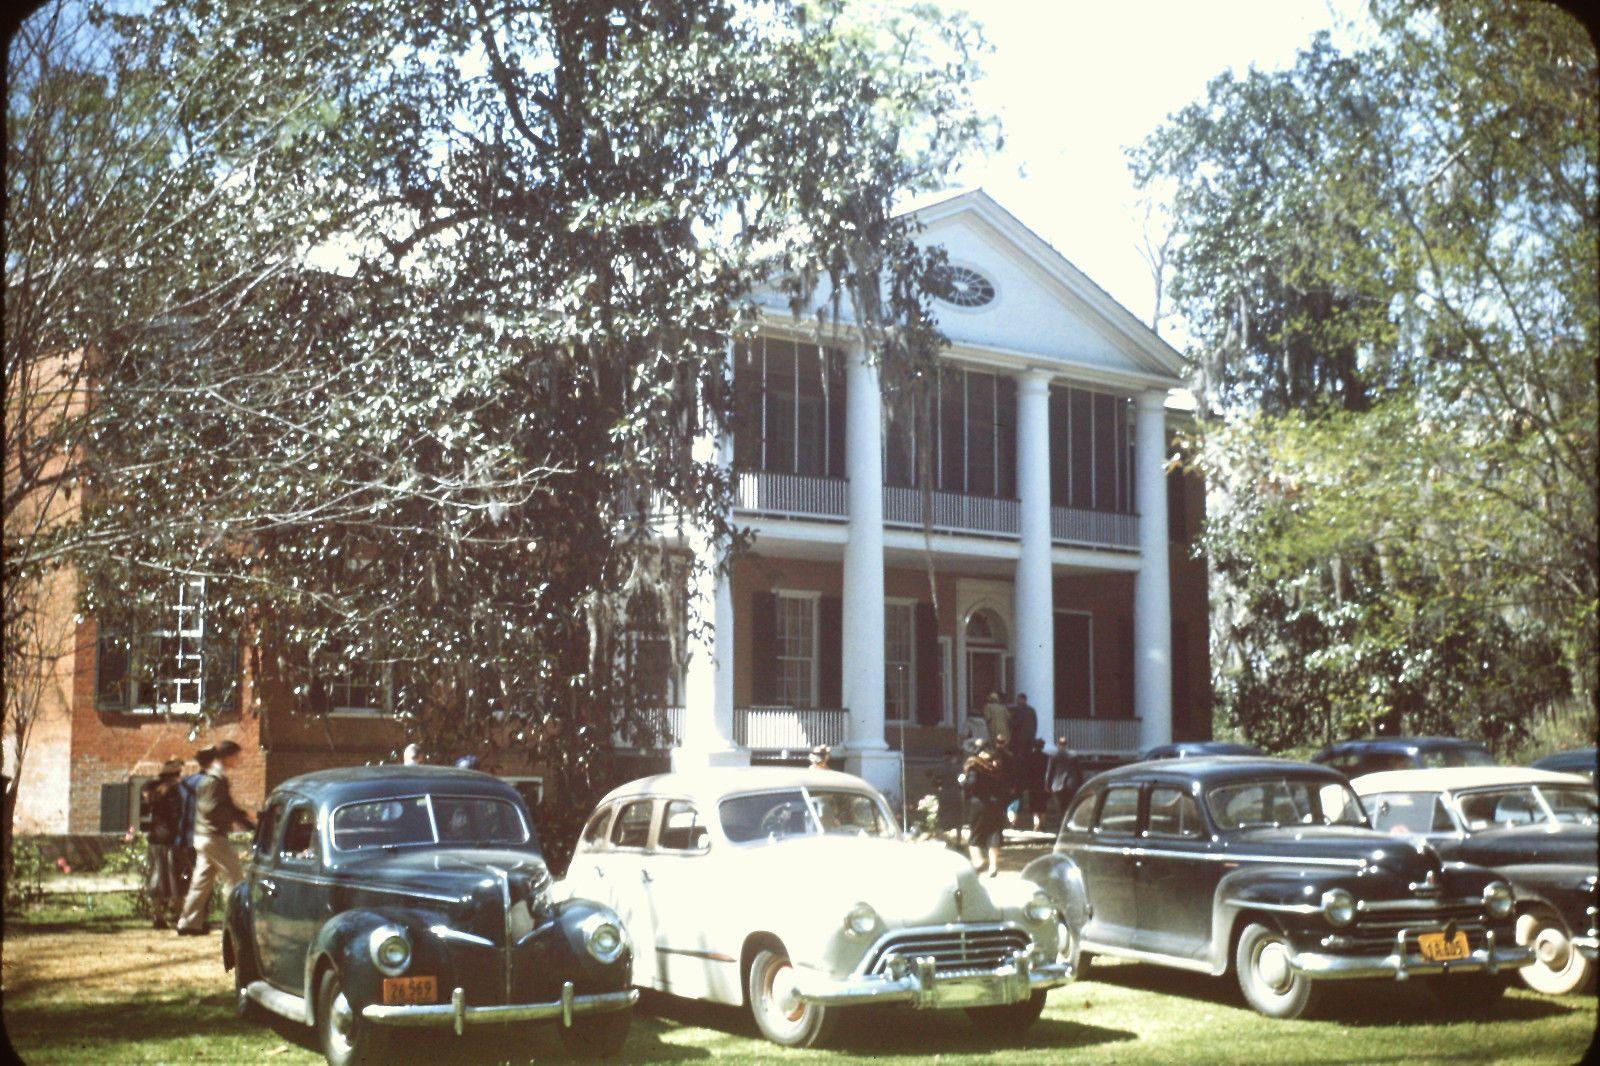 1949 NATCHEZ MS GLOUCESTER MANSION 35MM KODACHROME RED BORDER SLIDE ...